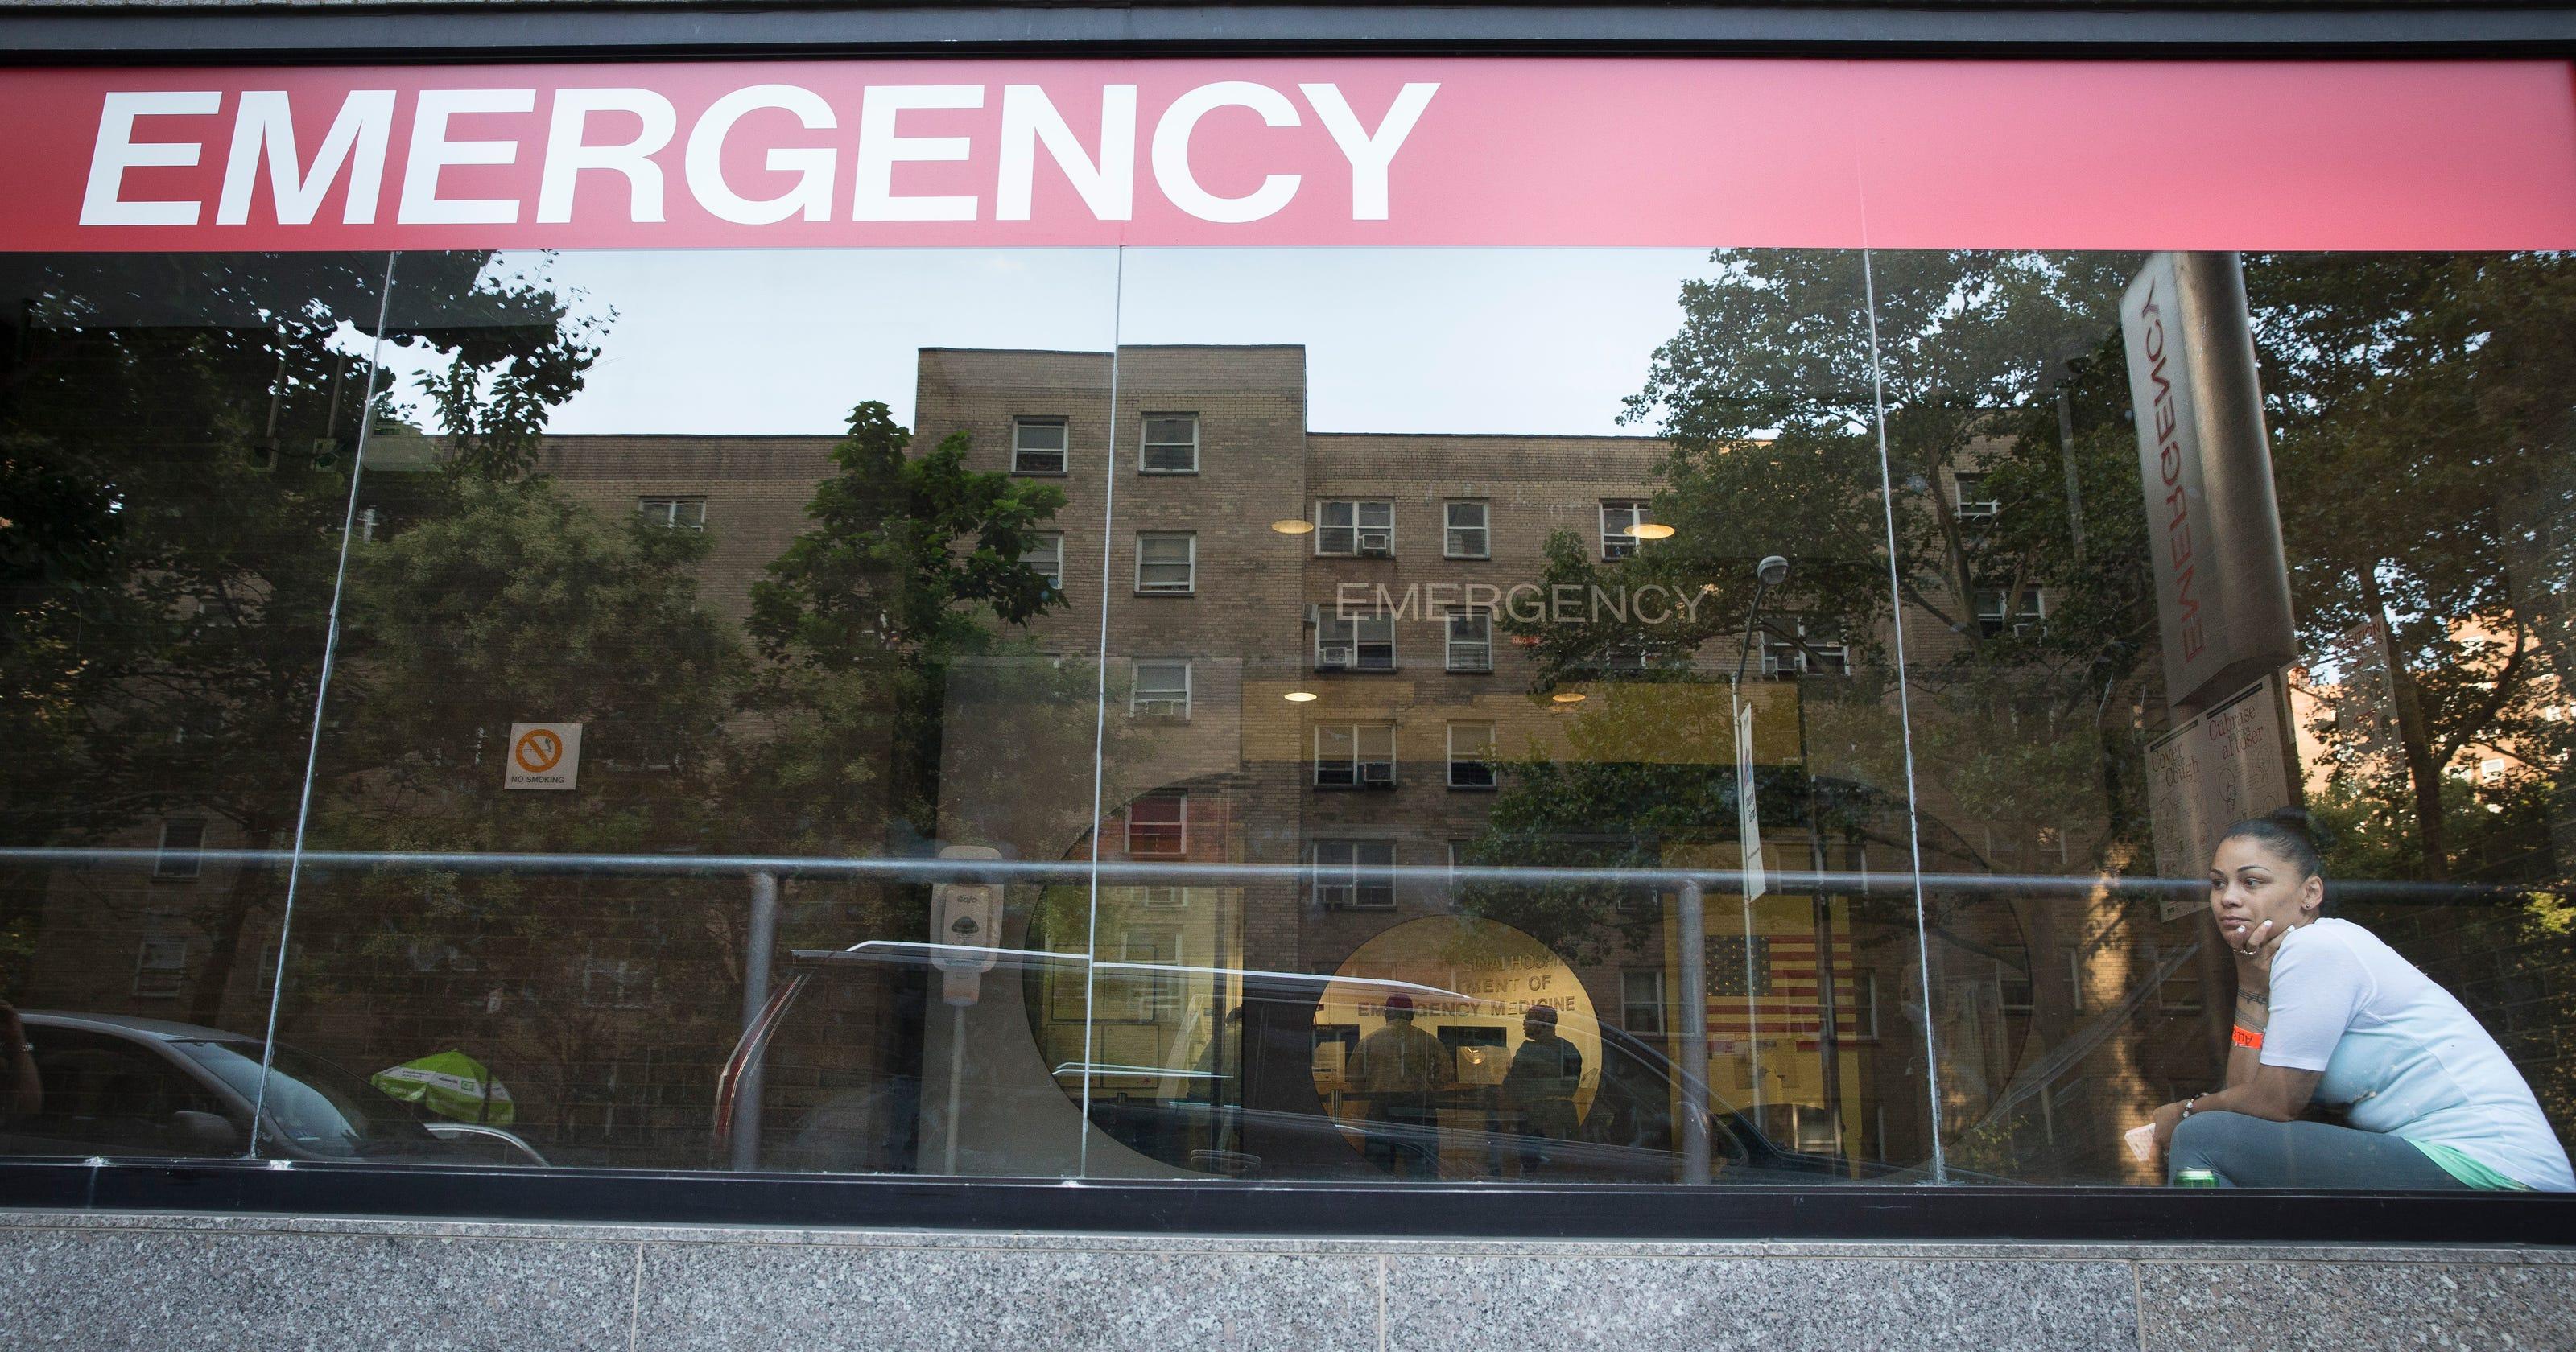 Top New York hospital executives, doctors got $80M in bonuses